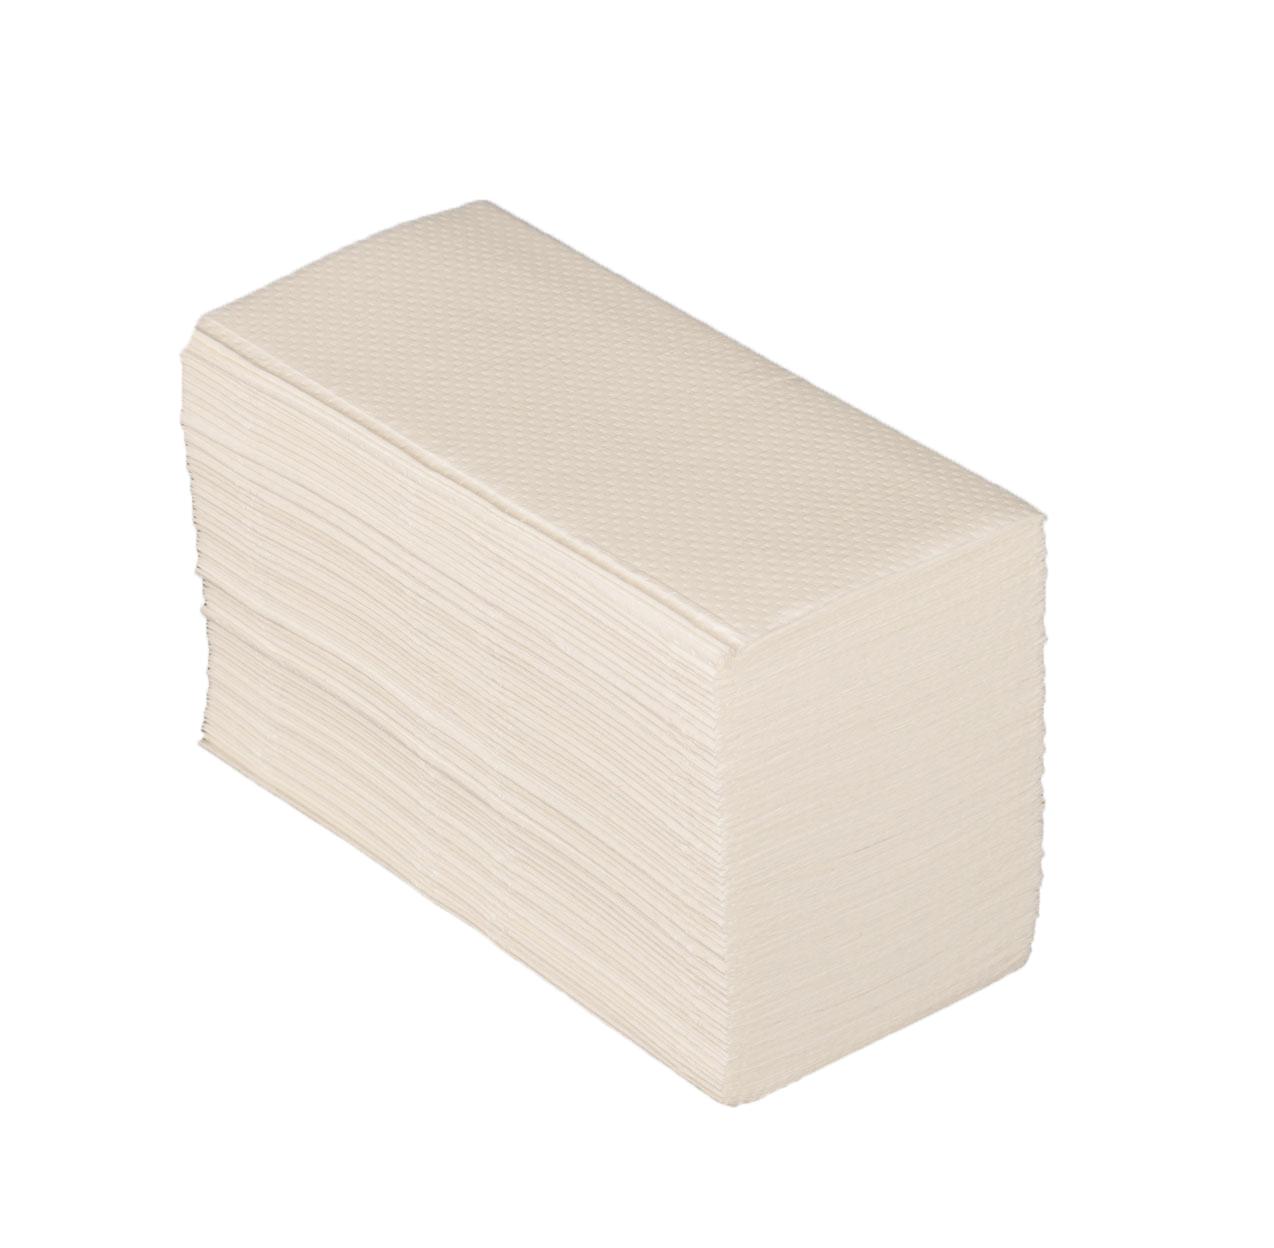 HANDTOWEL - White Vfold 23x25cm (eco.1p)